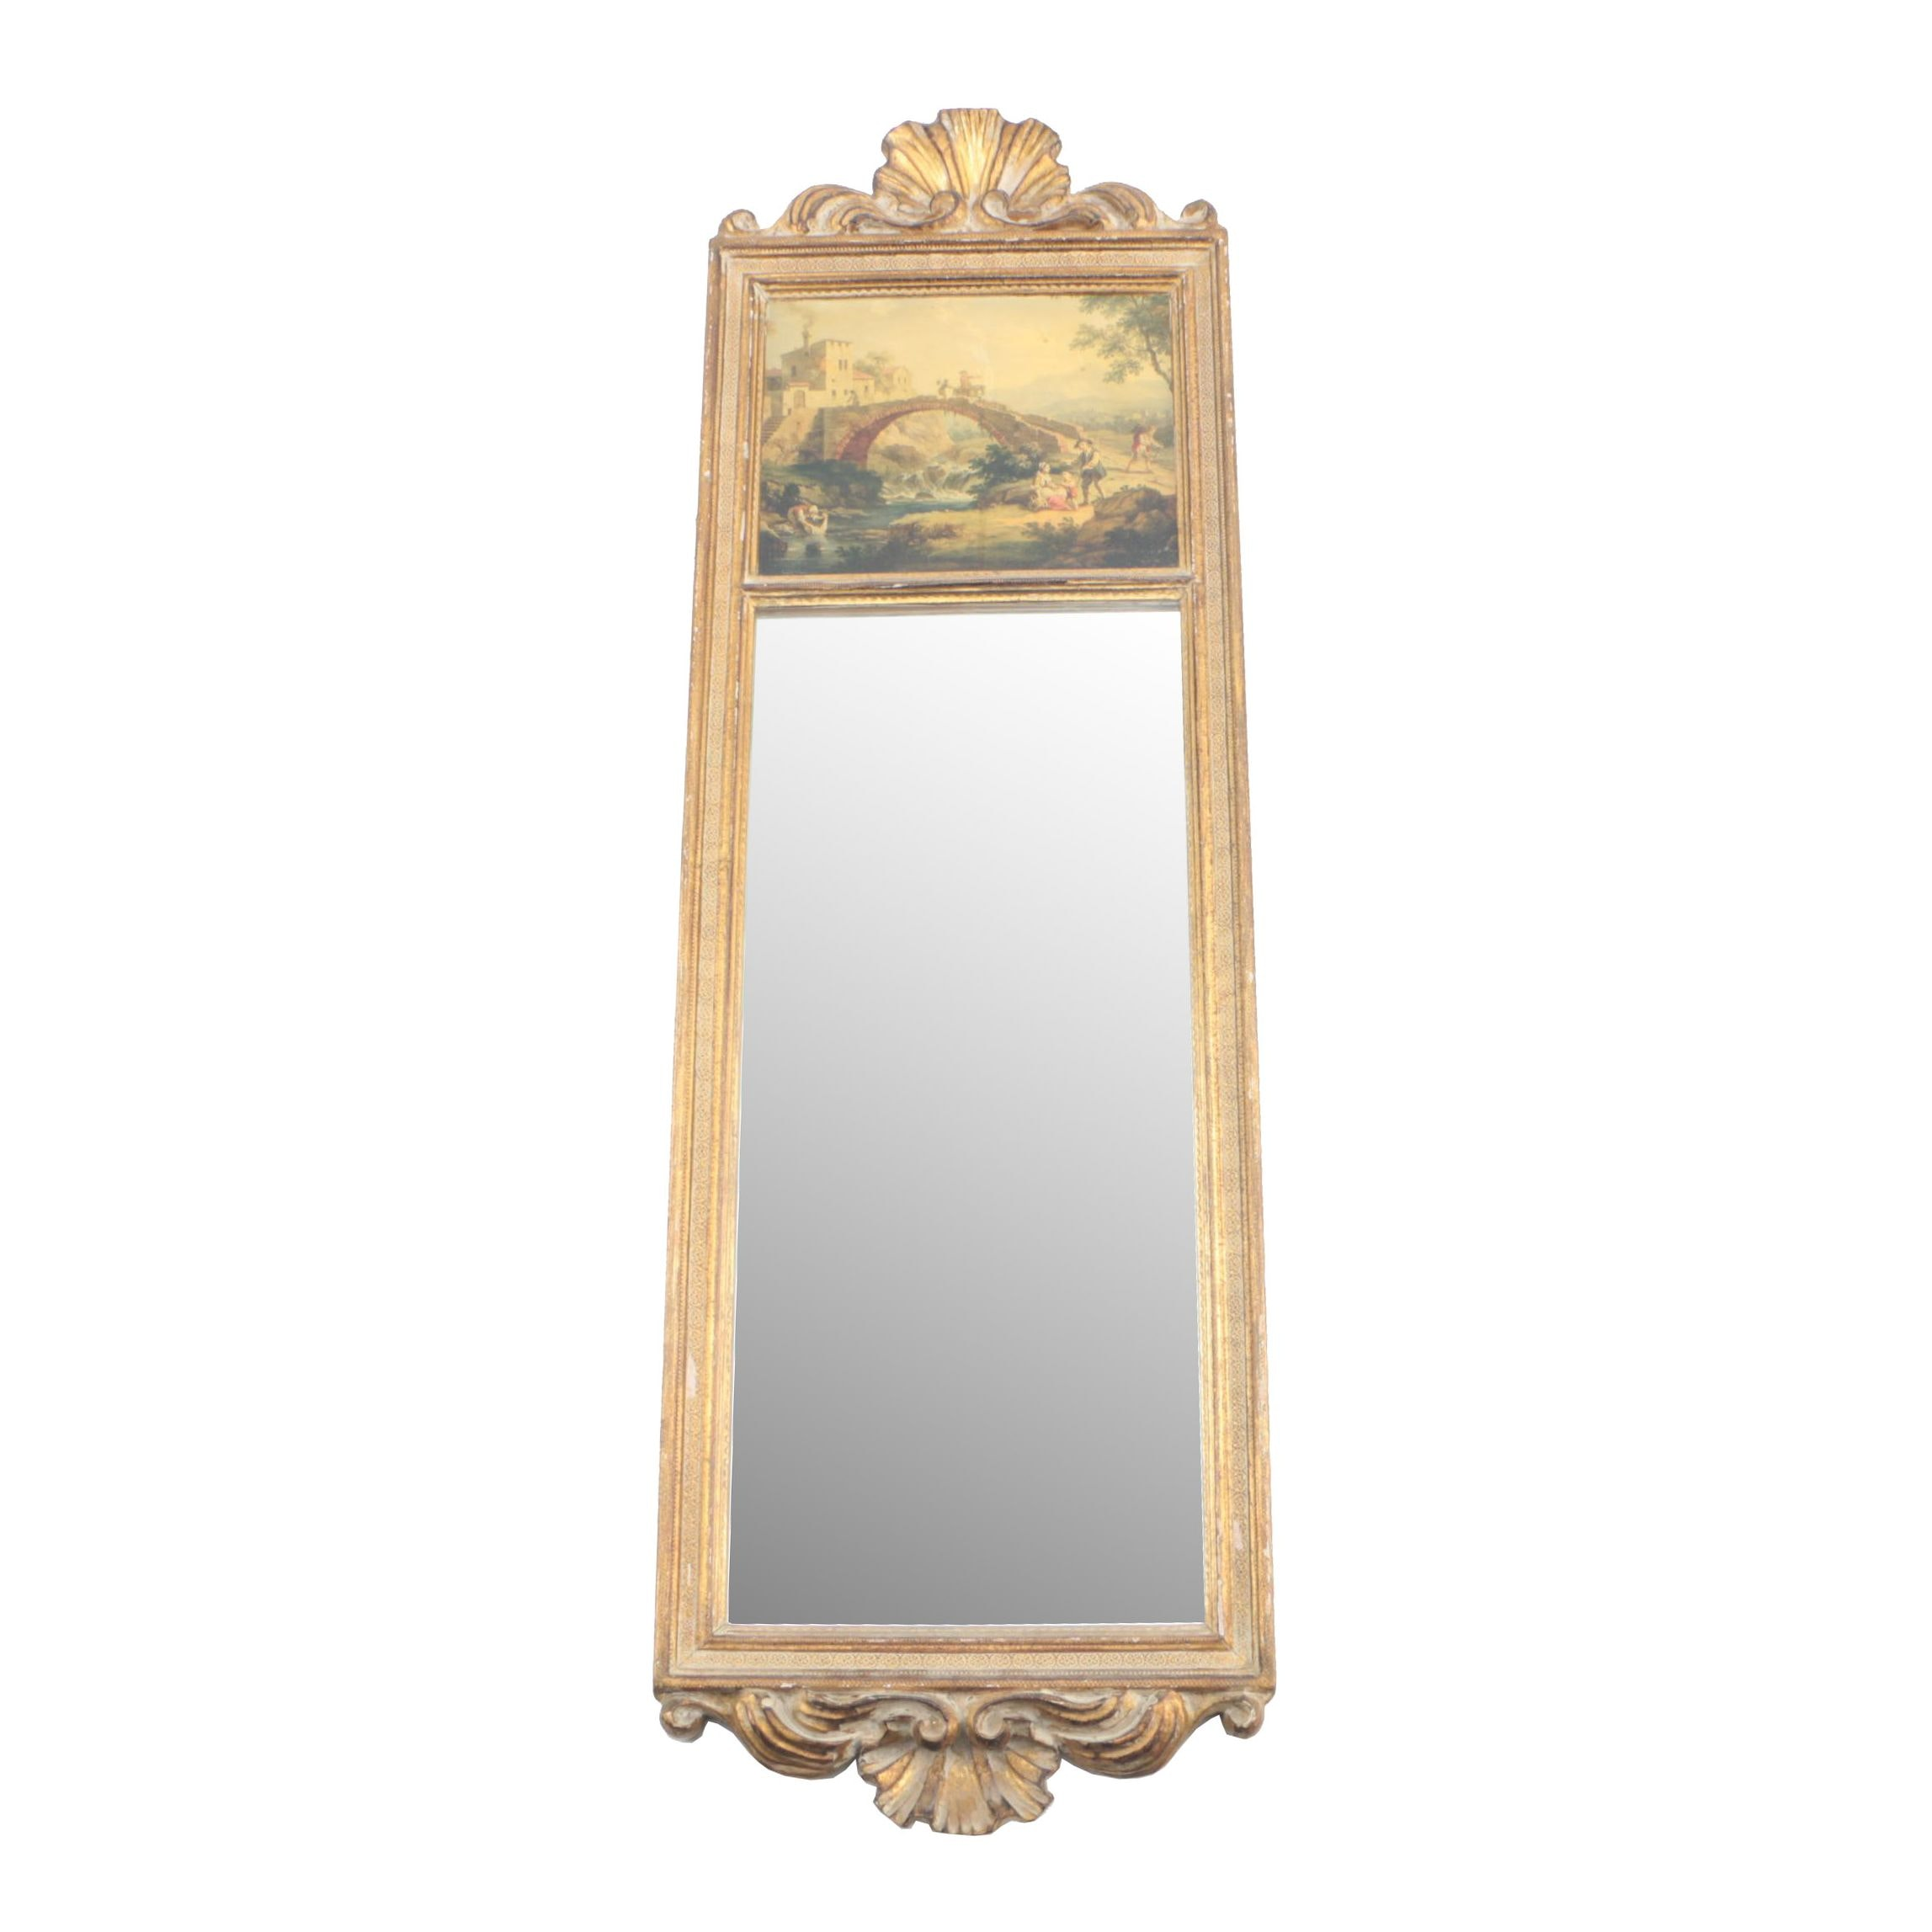 Italian Trumeau Mirror with Colored Collotype after Vittorio A. Cignaroli